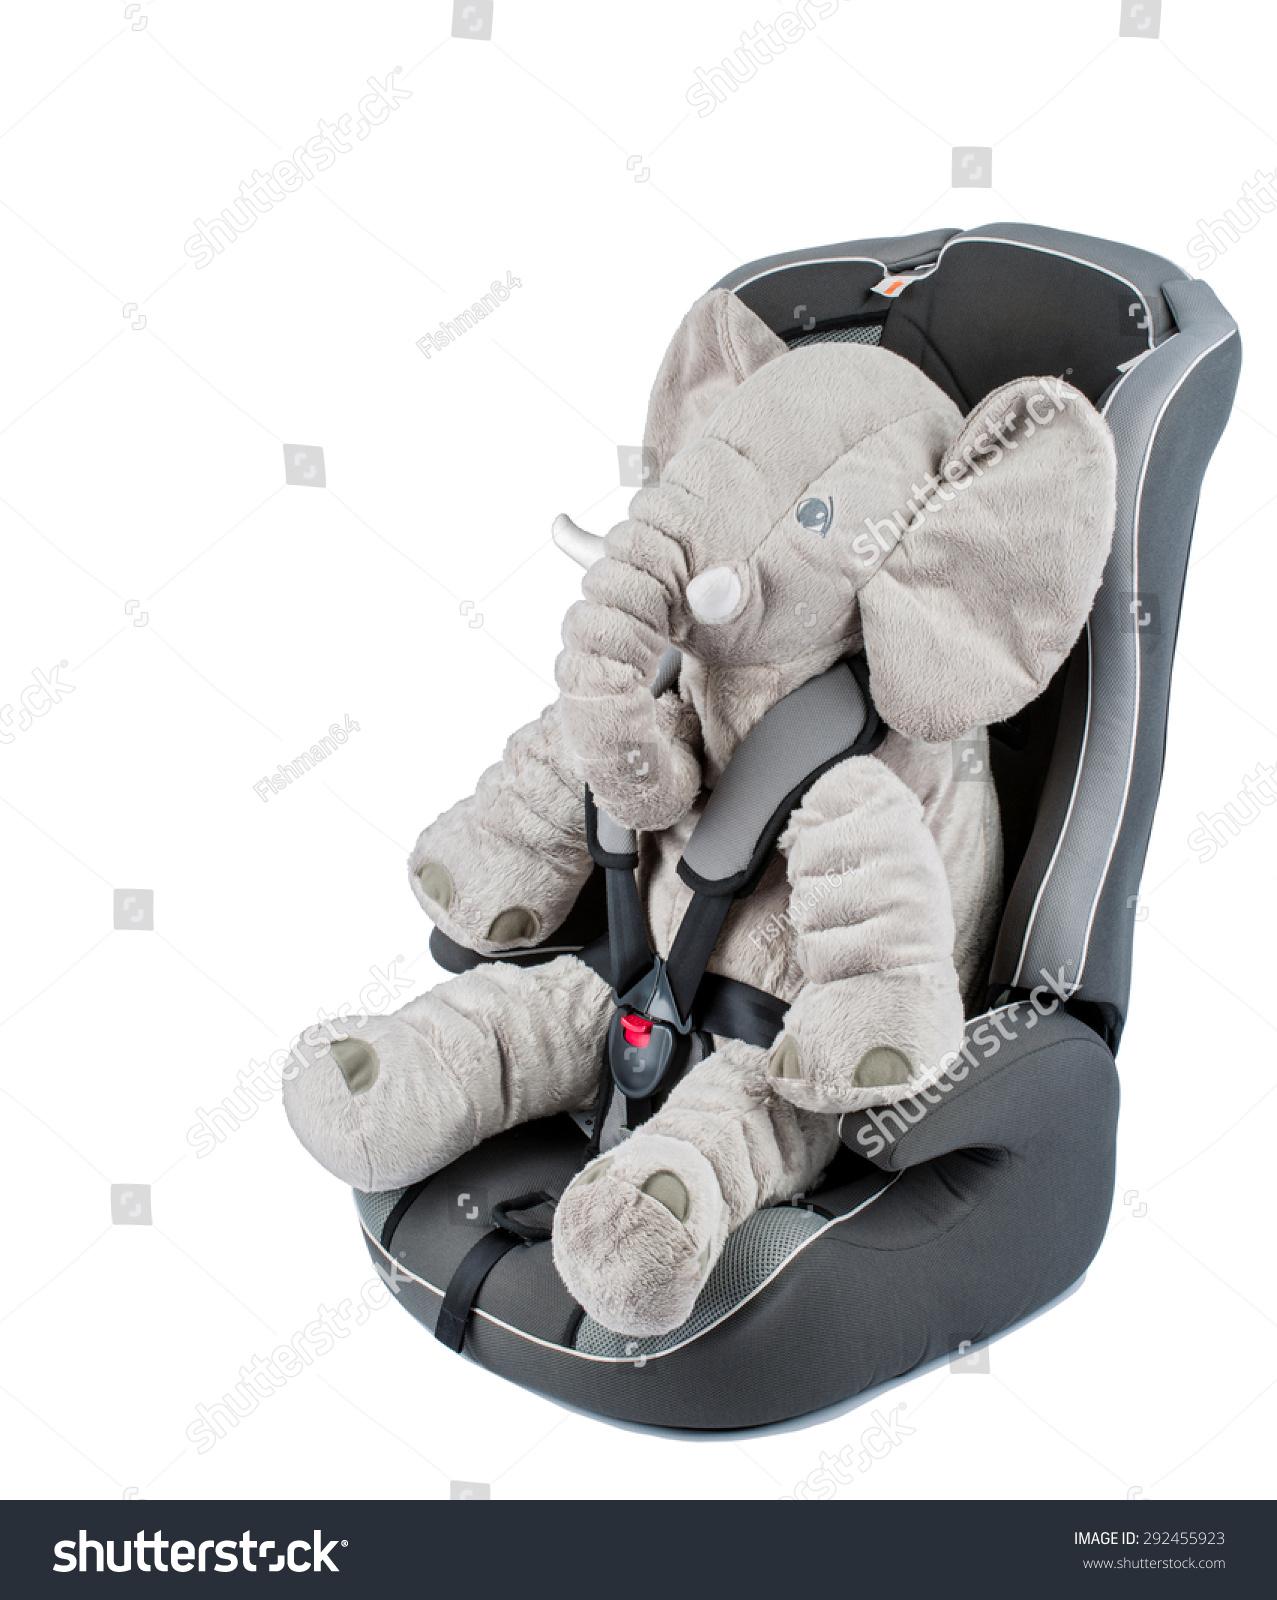 Baby Car Seat Gray Elephant